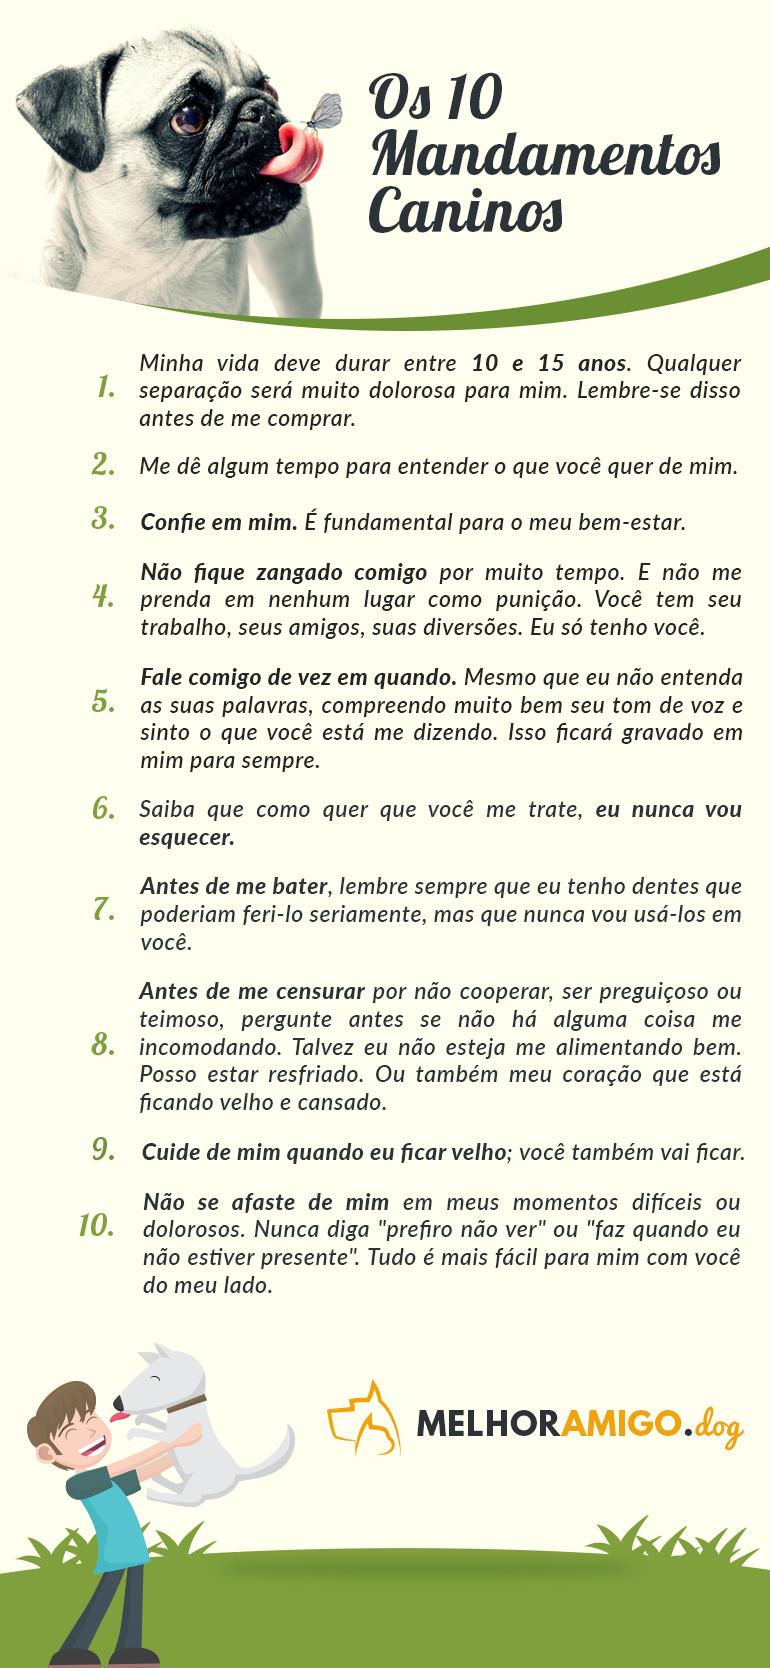 10 mandamentos caninos